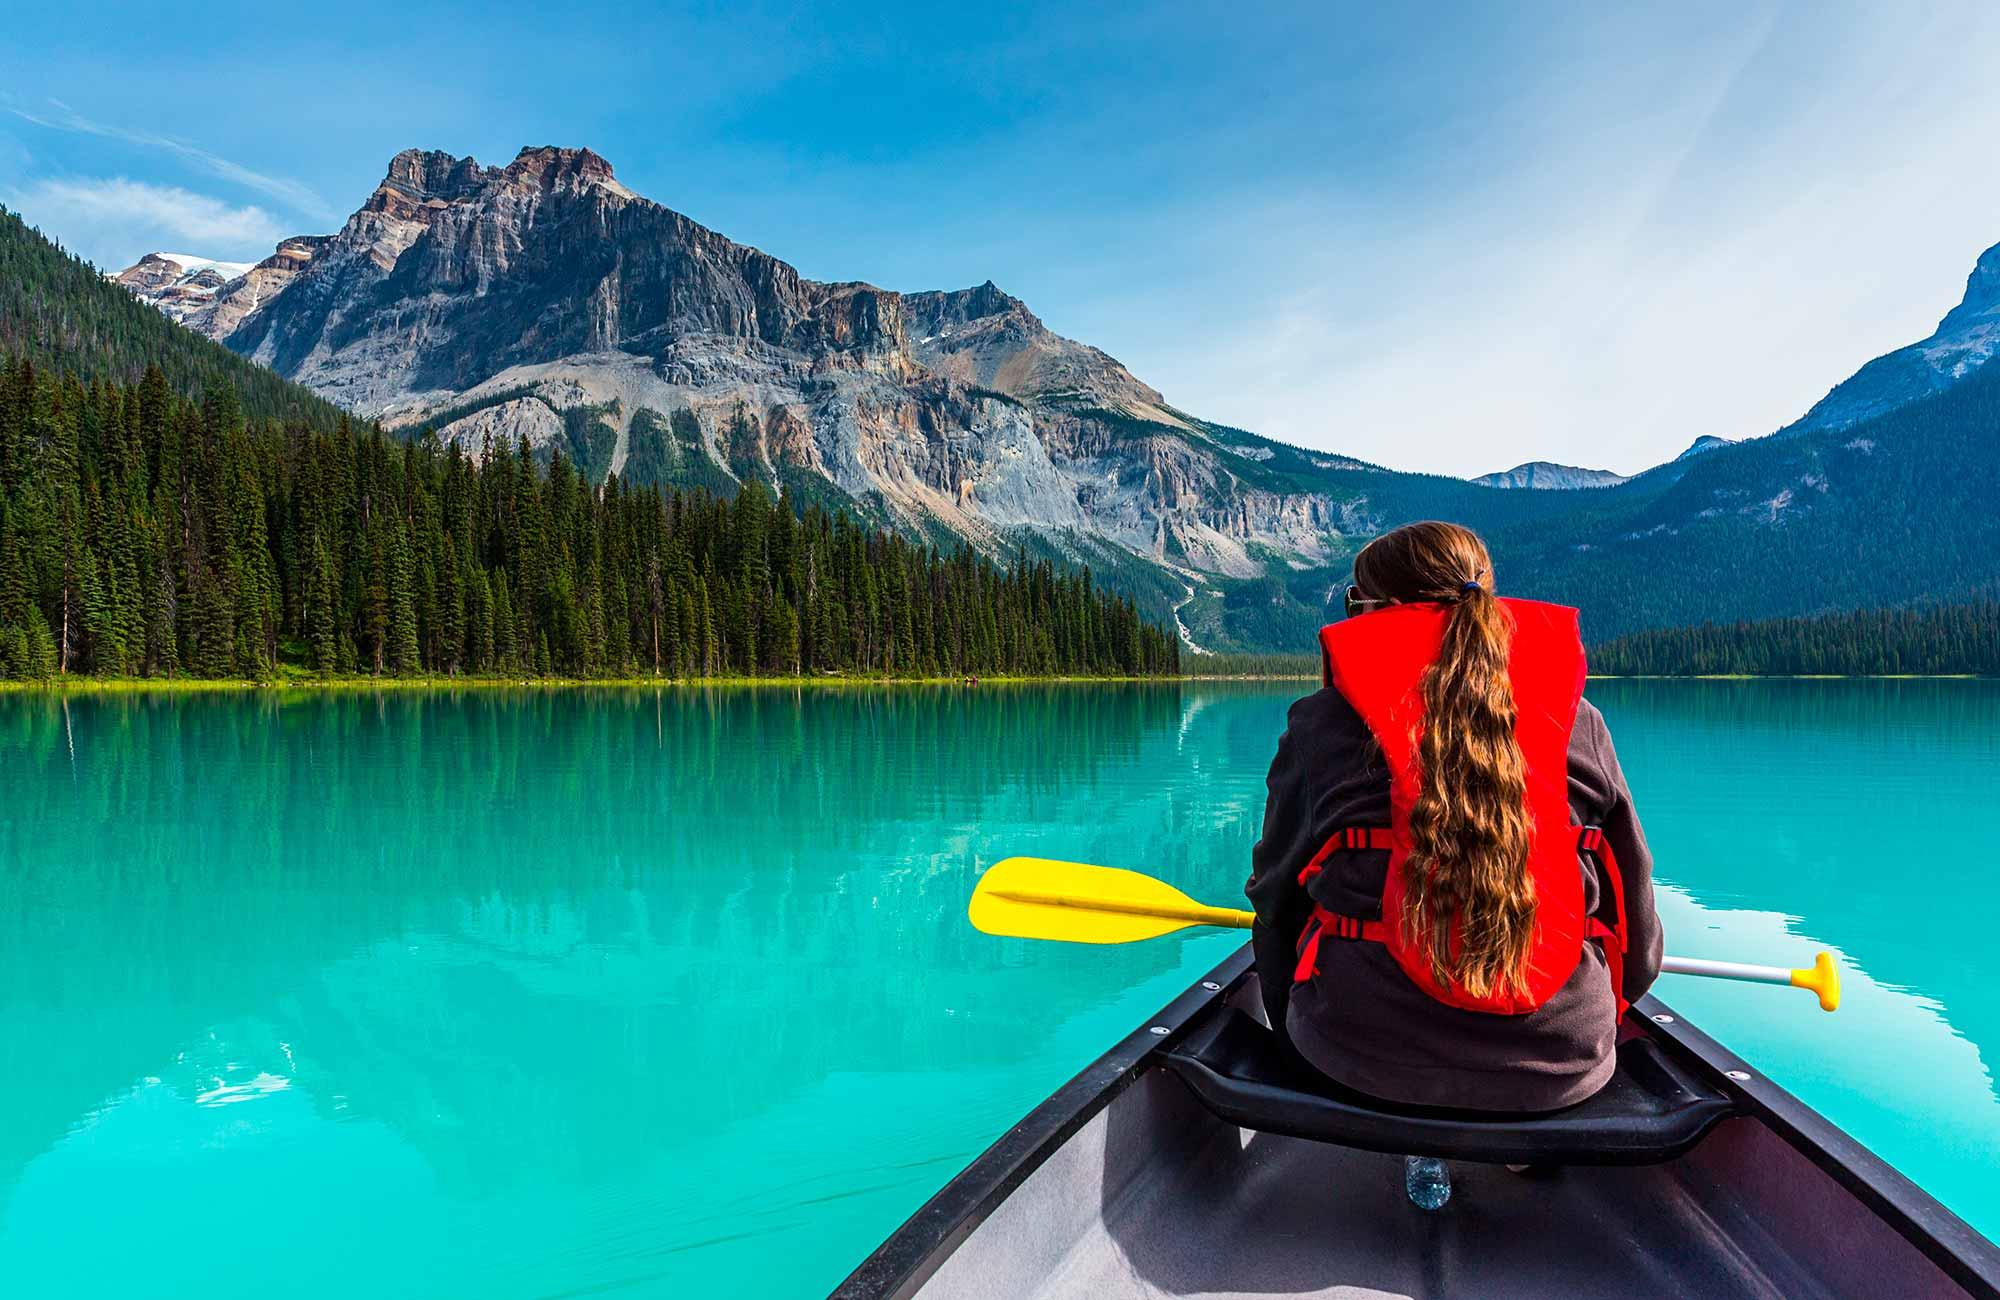 Voyage Canada - Parc National Yoho - Amplitudes